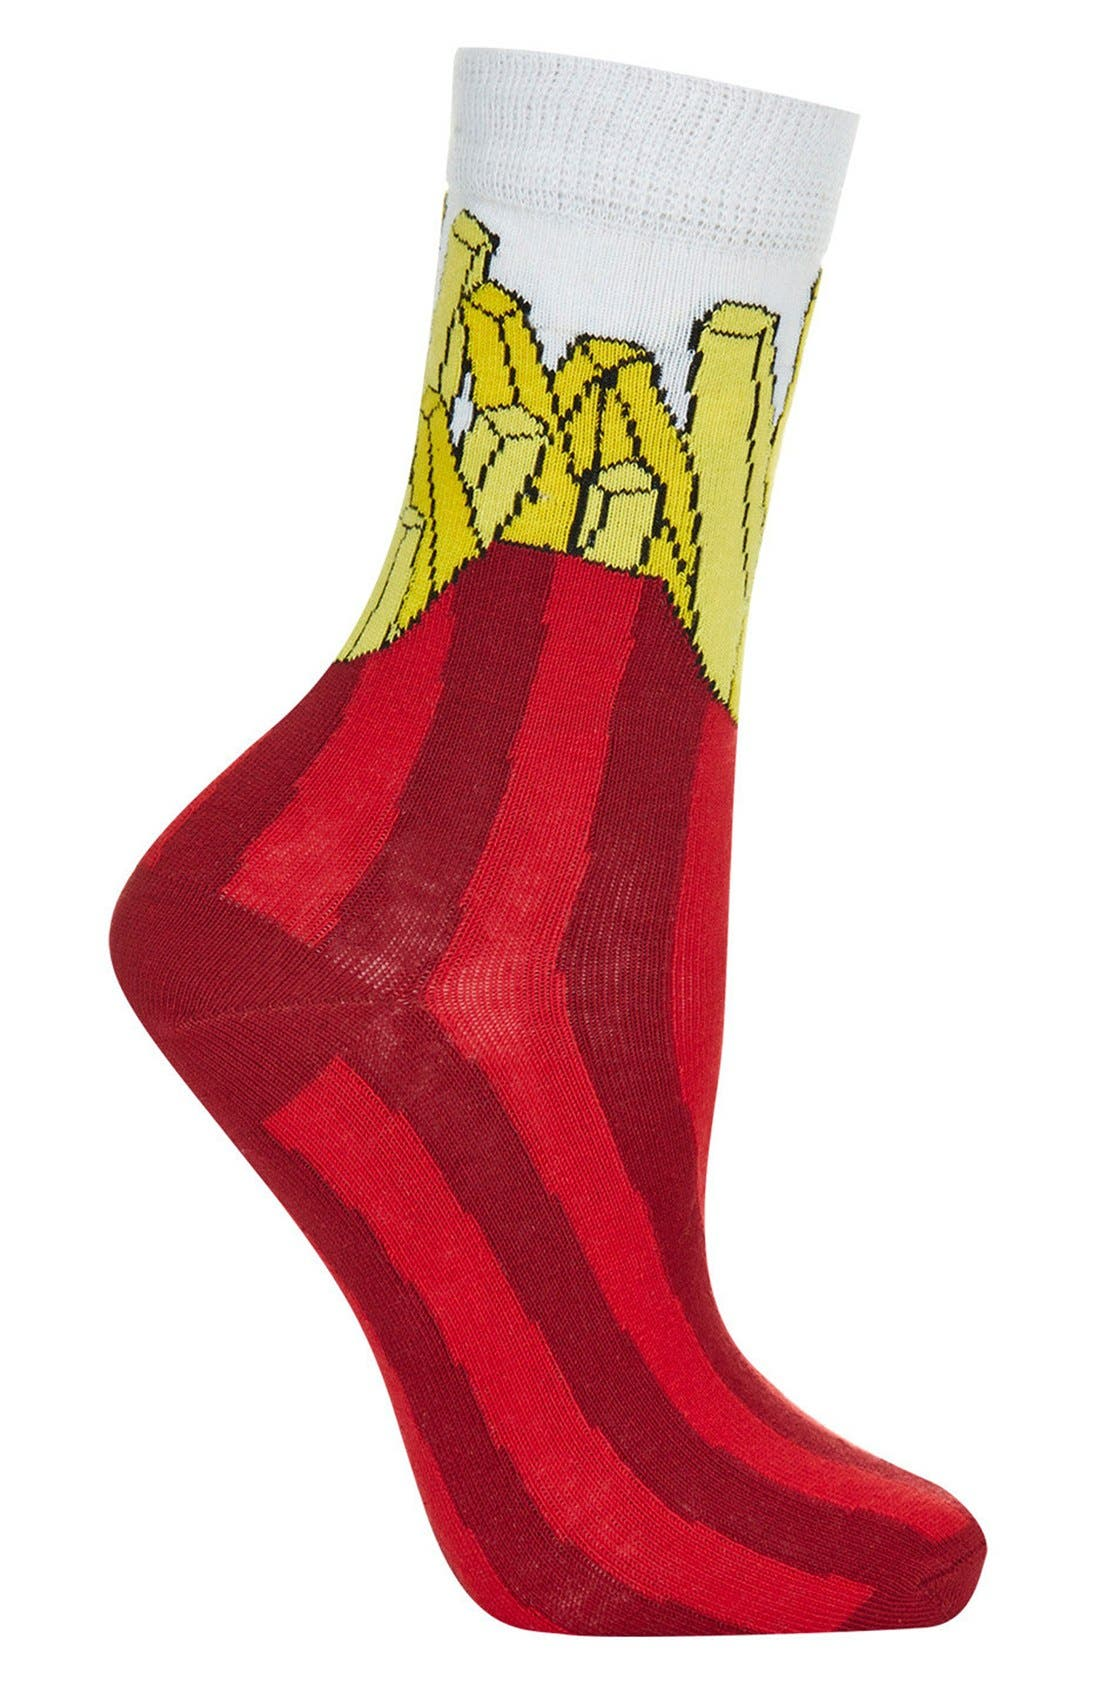 Alternate Image 1 Selected - Topshop Fries Crew Socks